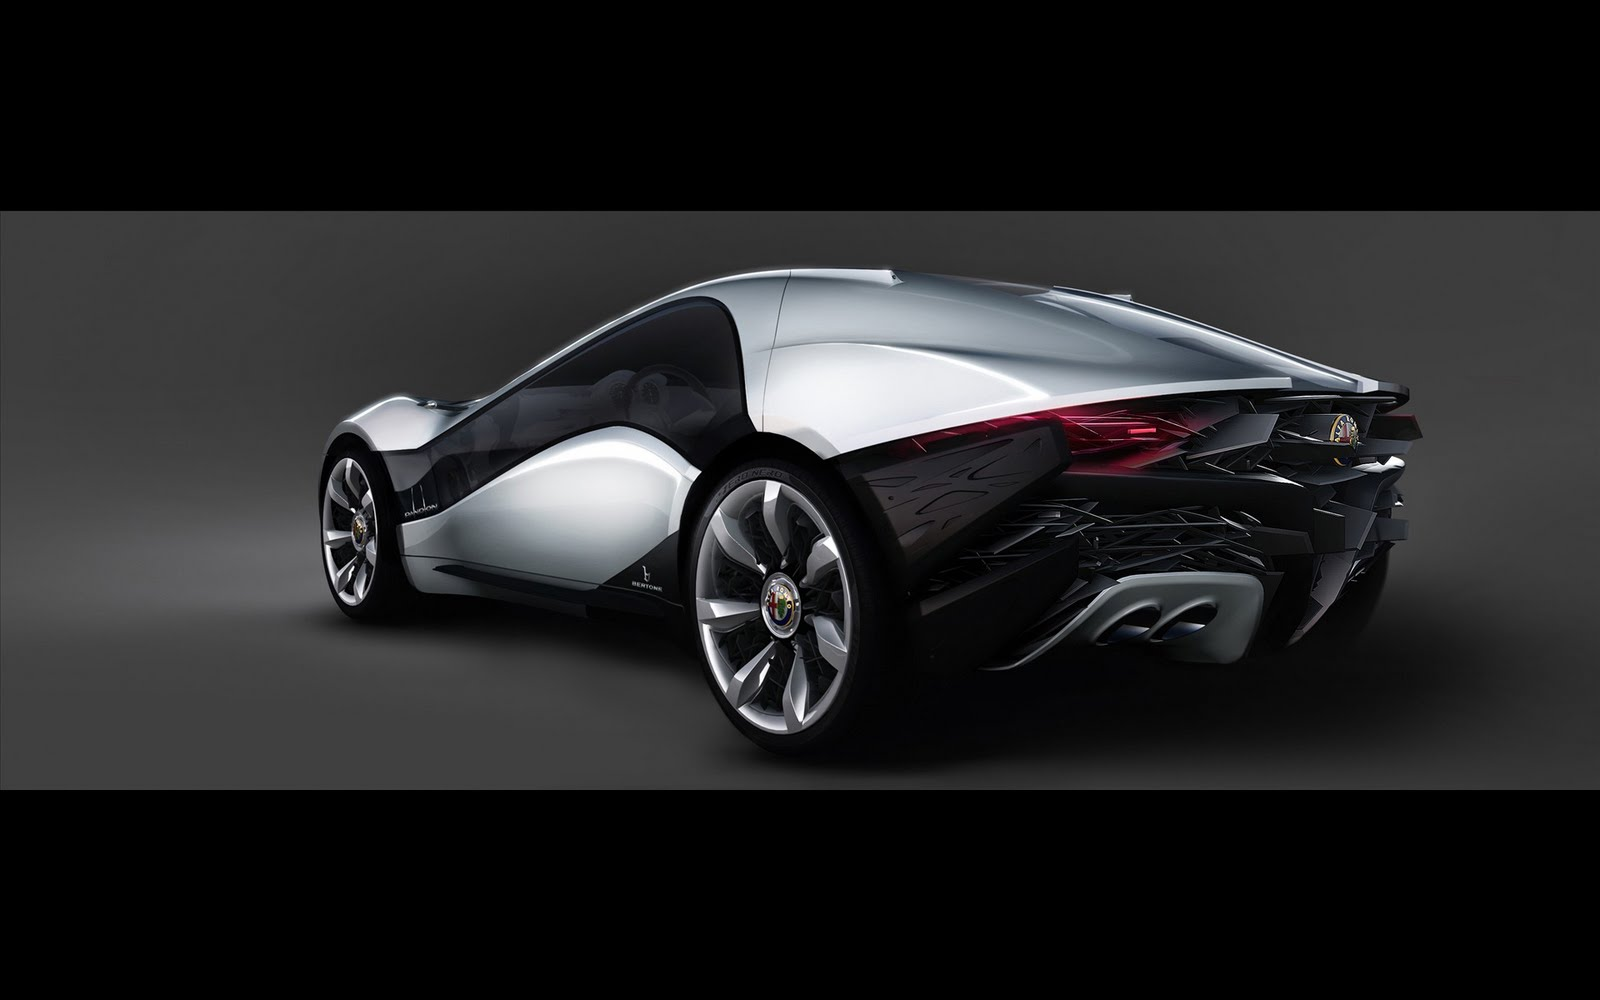 bertone pandion dream alfa romeo car wallpaper car pictures. Black Bedroom Furniture Sets. Home Design Ideas